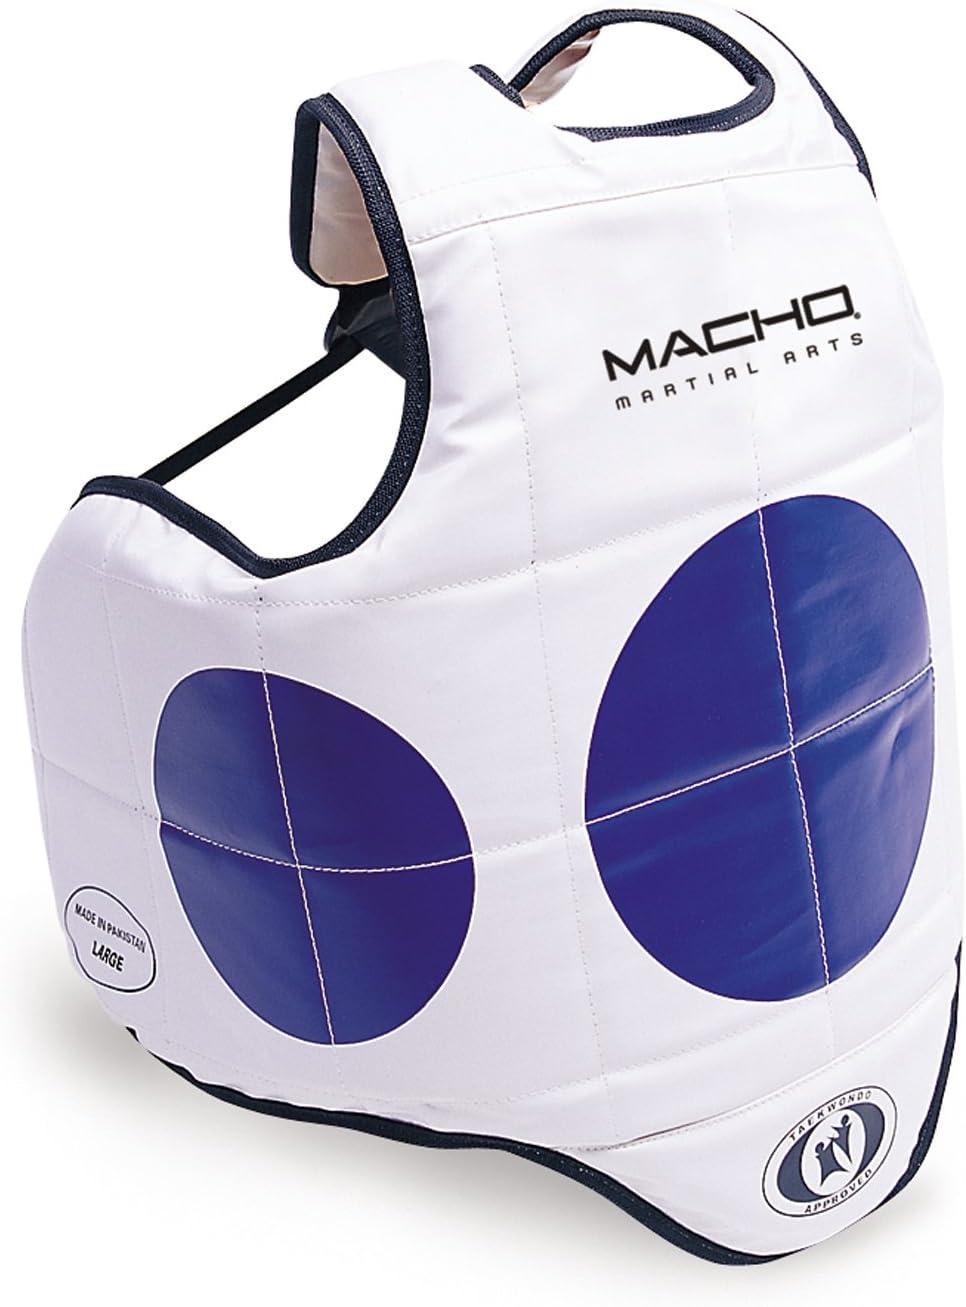 Macho Reversible Hogu High order Popular brand in the world